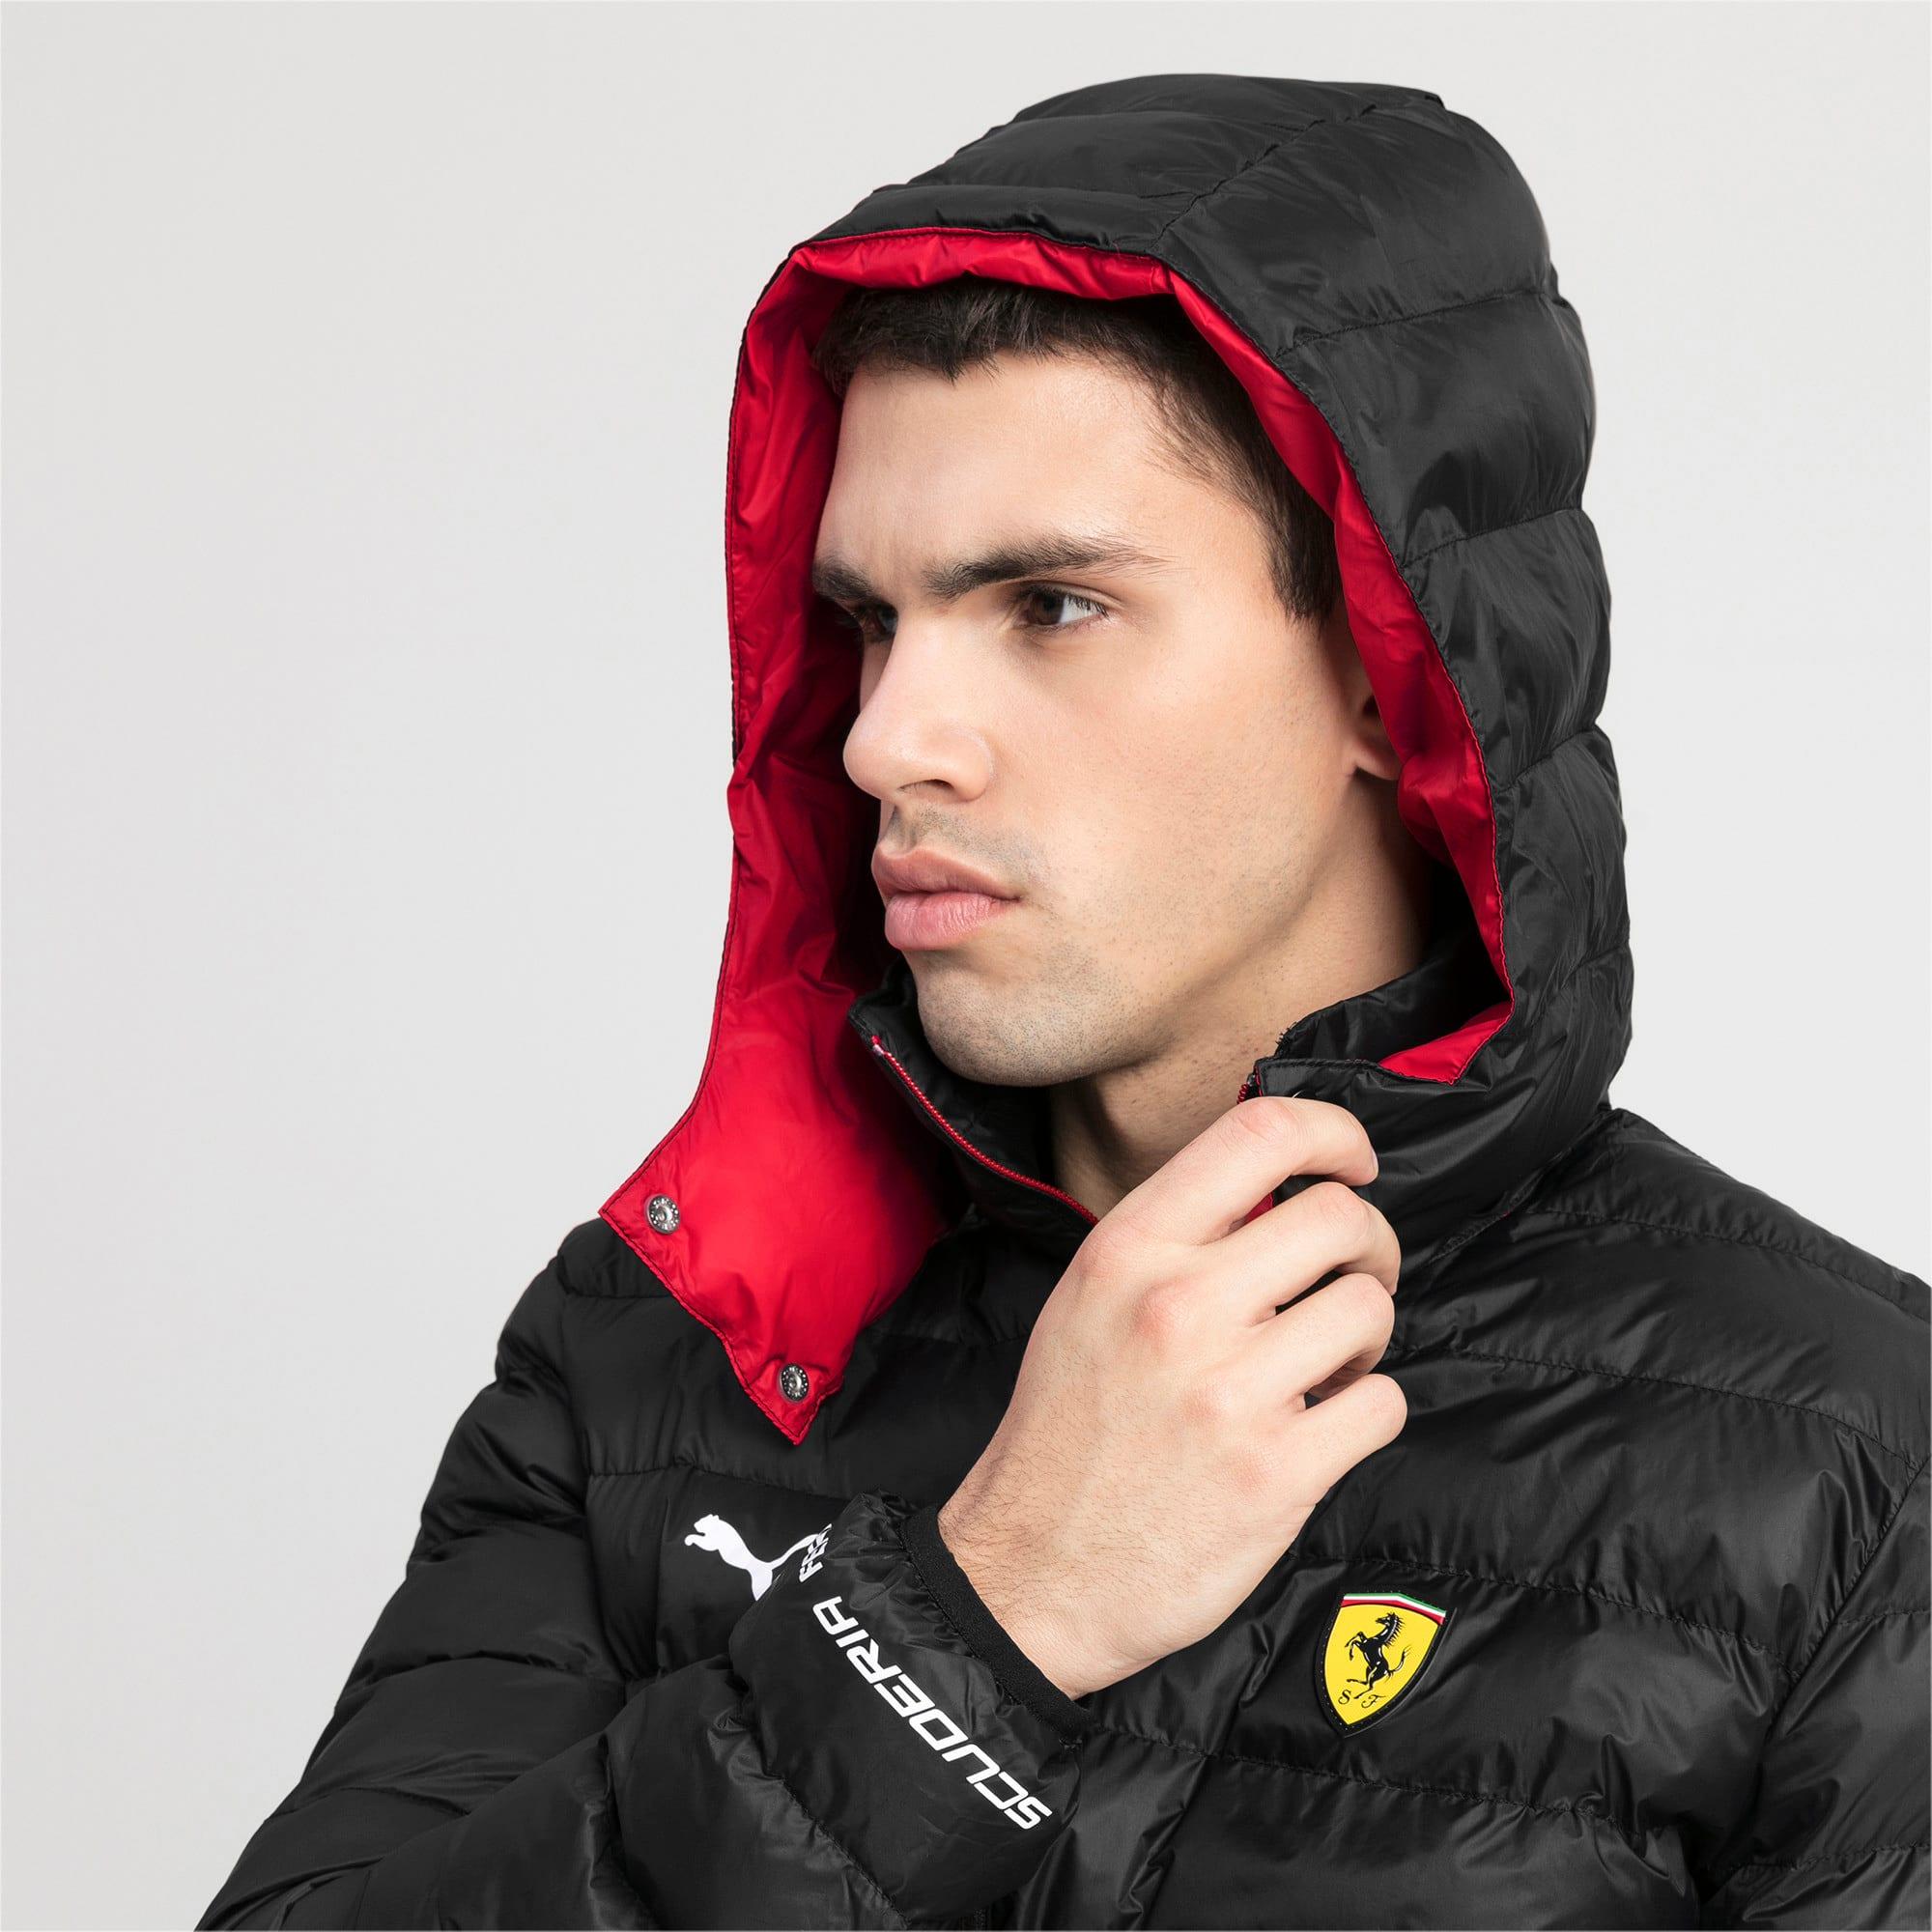 Thumbnail 4 of Ferrari Eco PackLITE Men's Jacket, Puma Black, medium